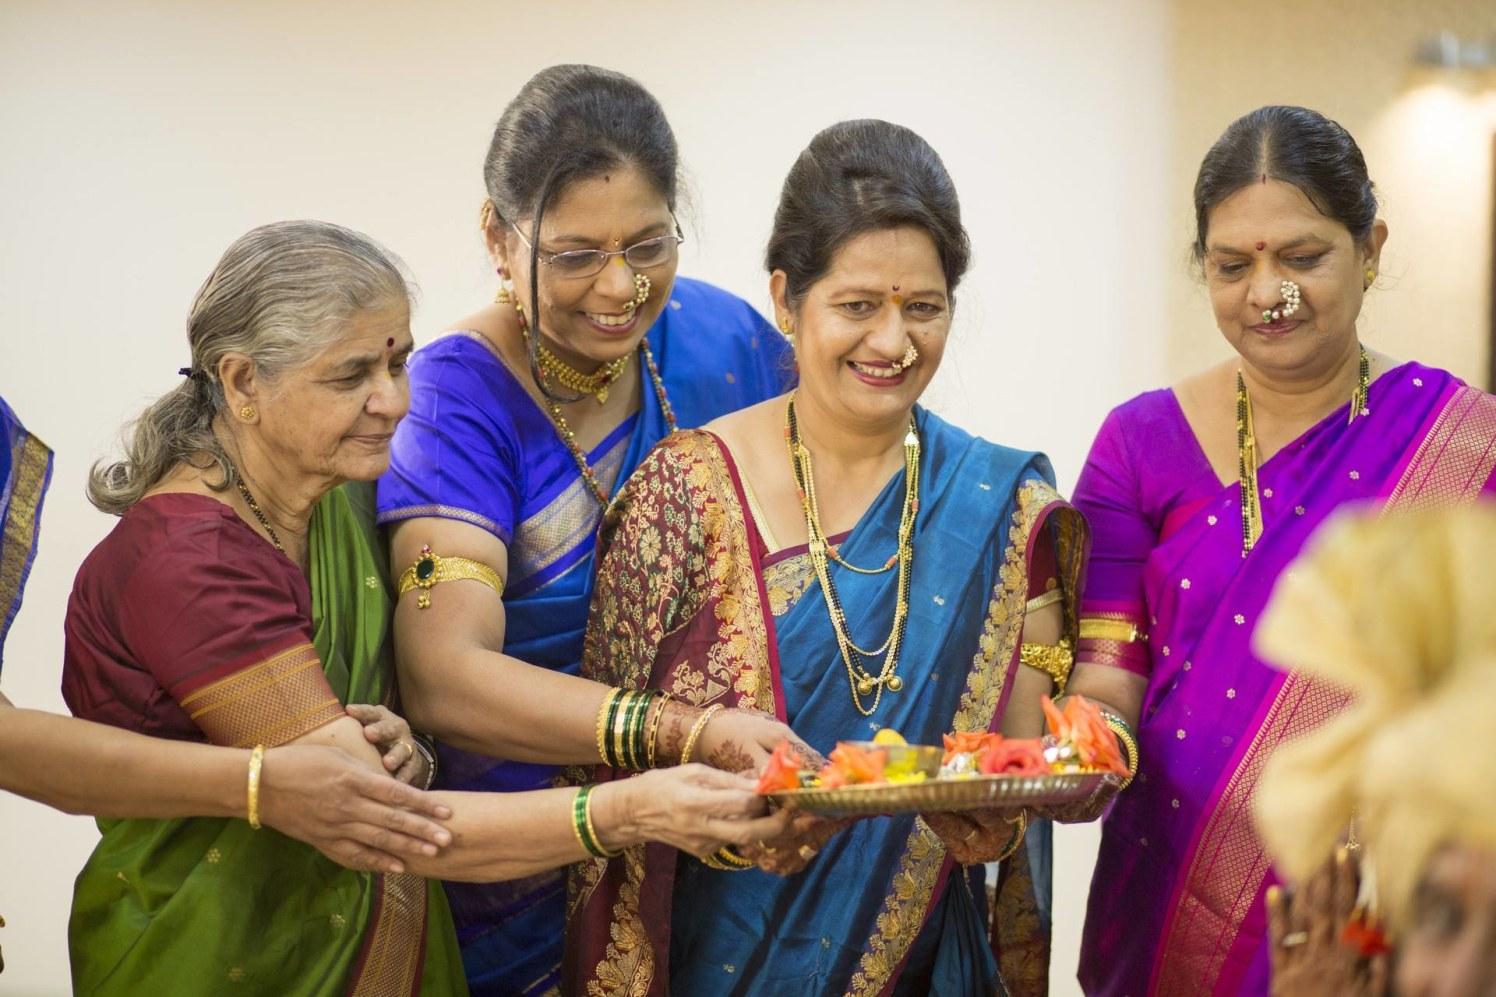 Gracious marathi ladies by Cuttlefish Photography Wedding-photography | Weddings Photos & Ideas